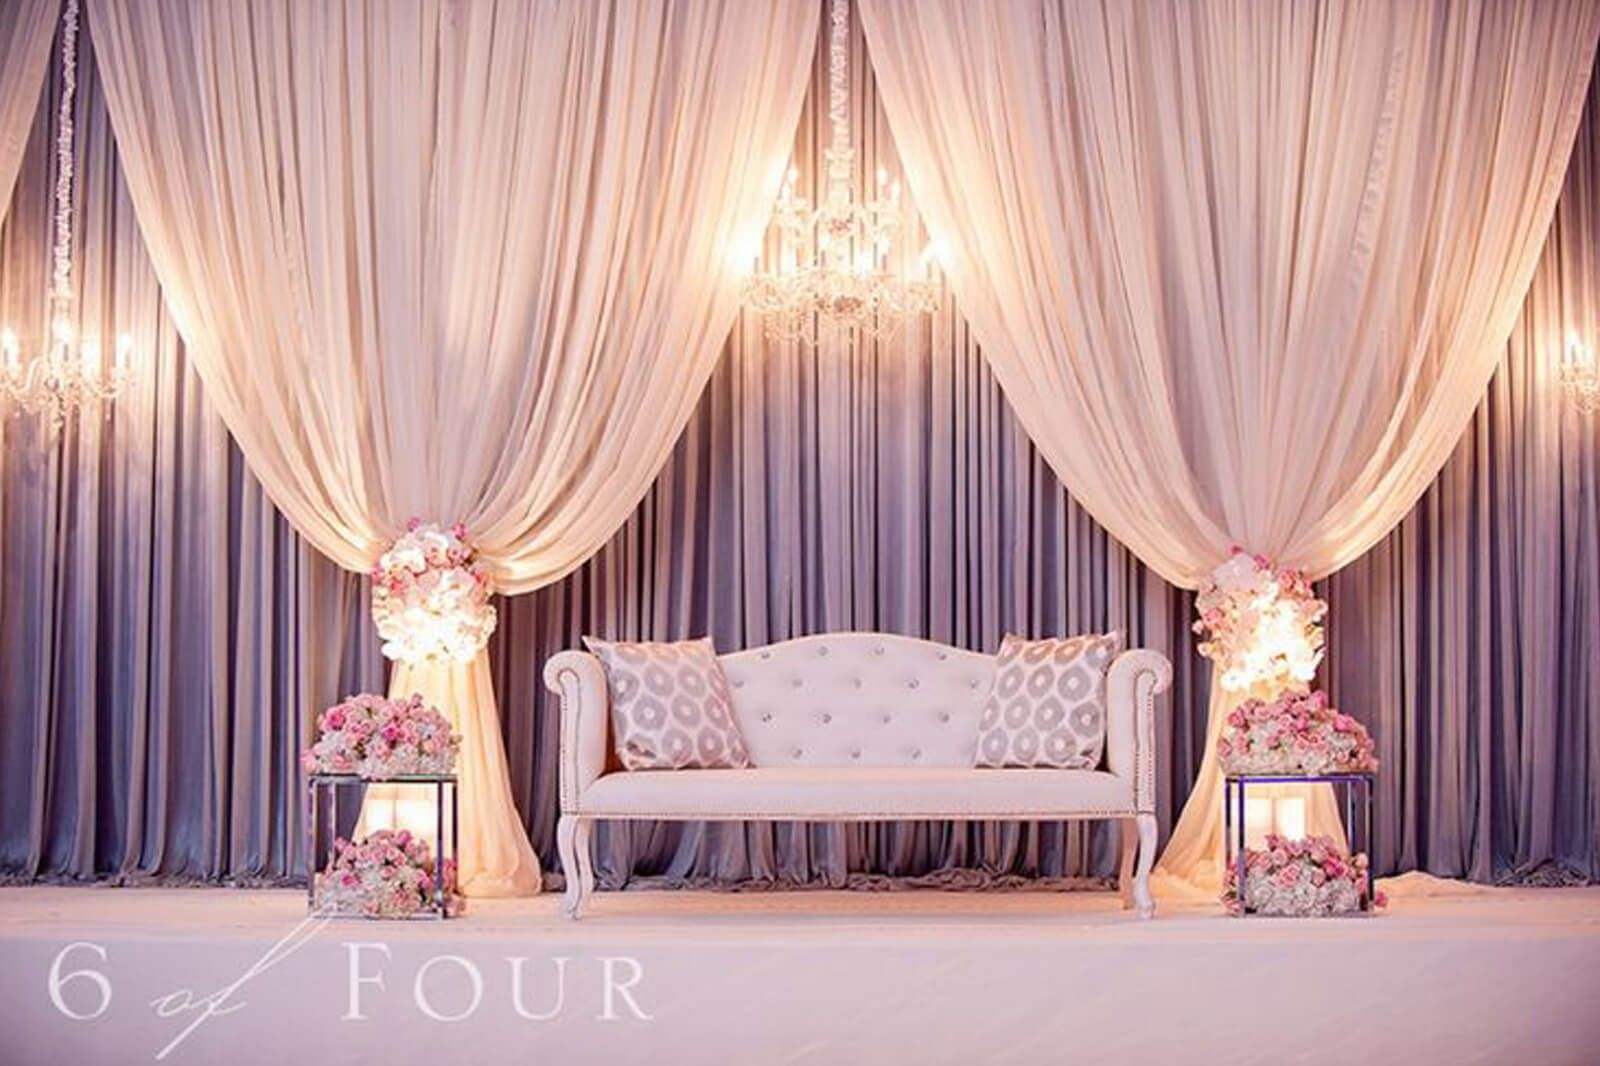 Indian wedding decorations | Wedding Ideas ❤ | Pinterest | Indian ...